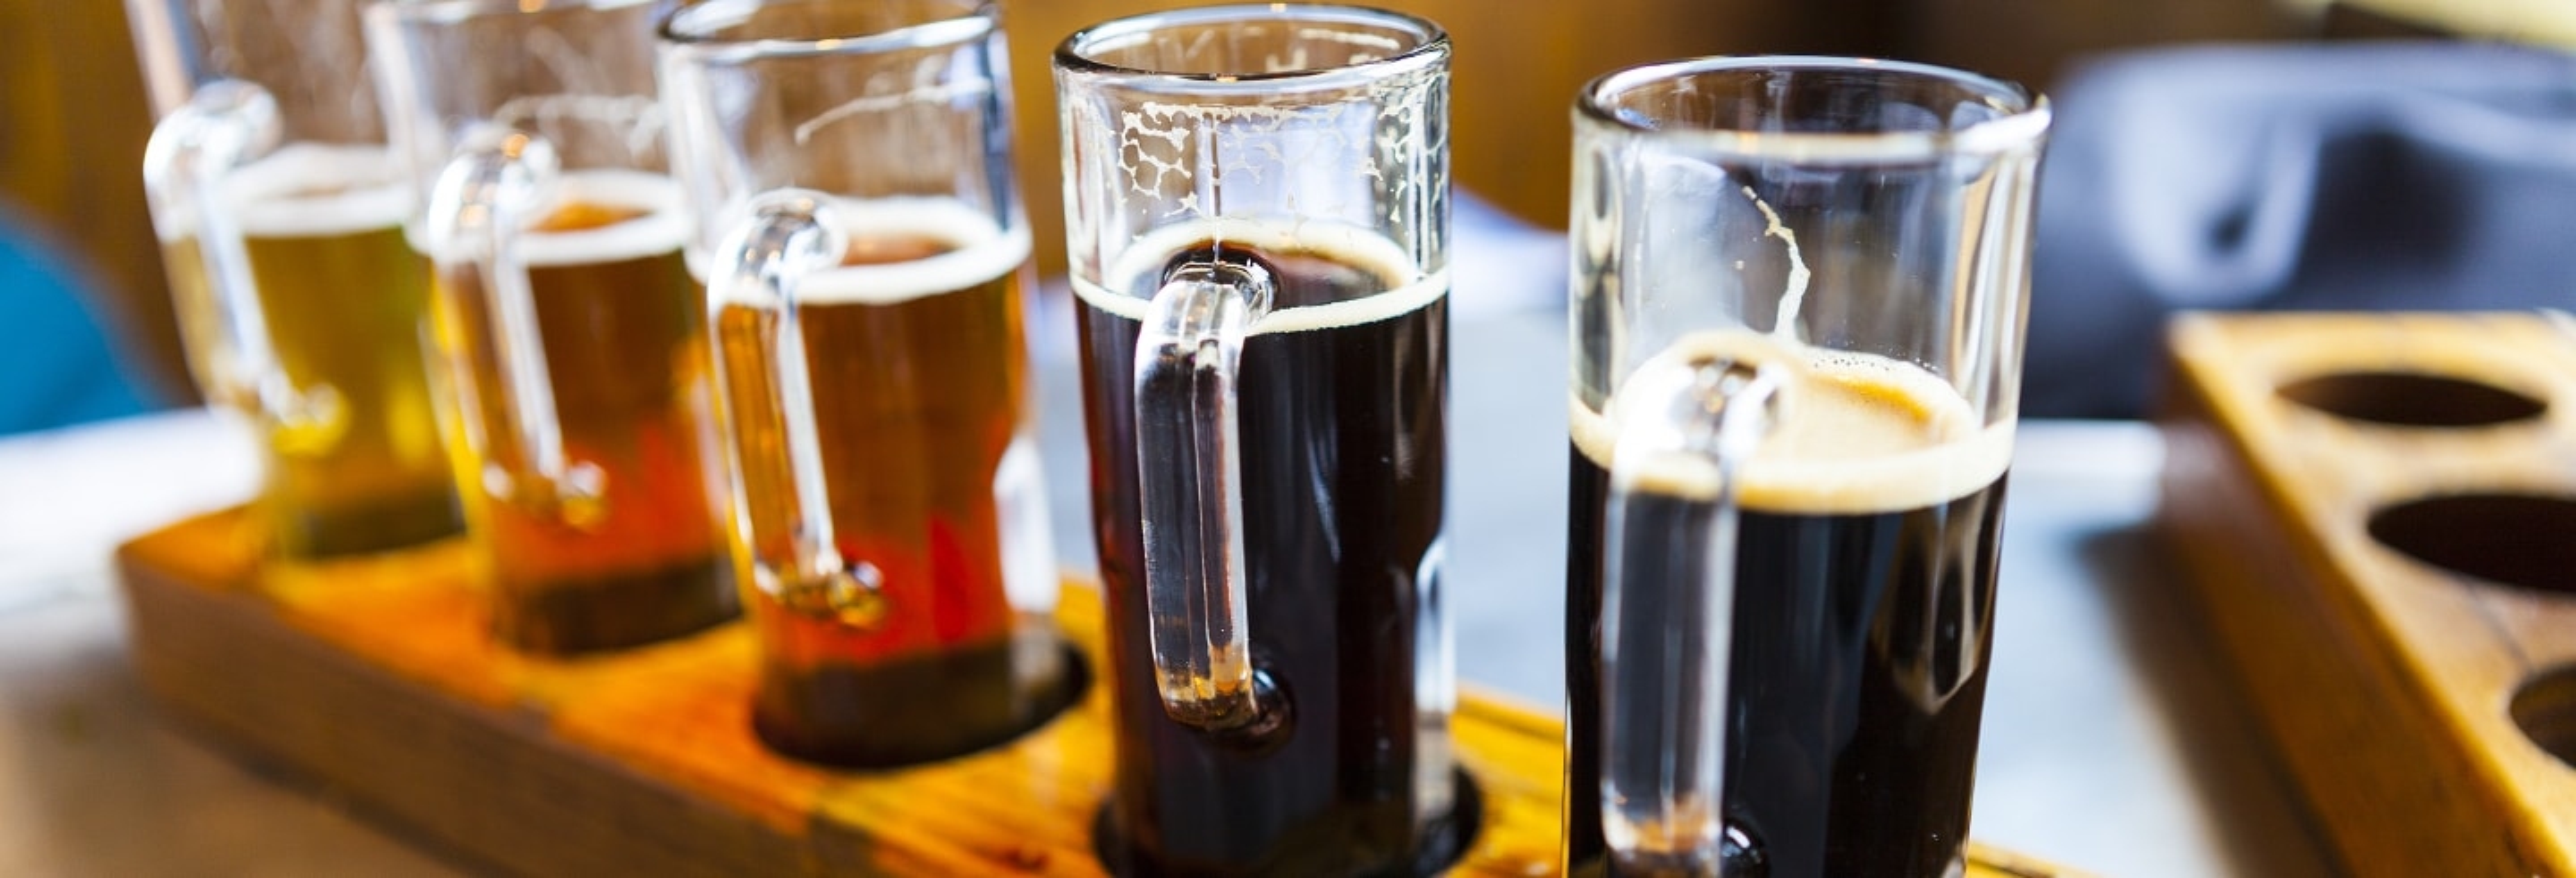 Tour della birra artigianale a San José